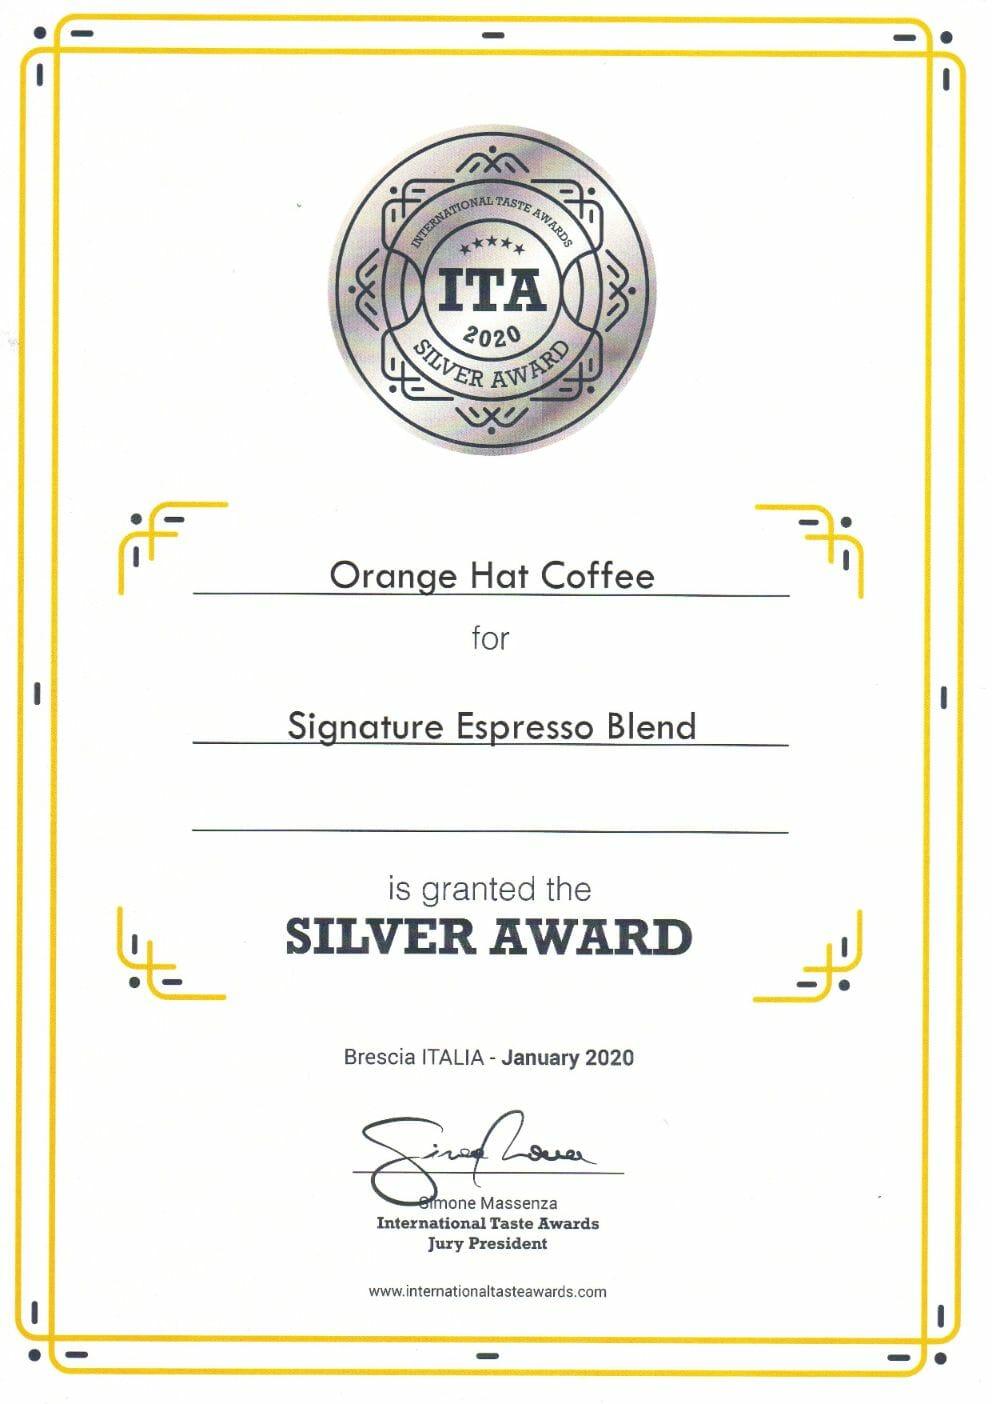 Orange Hat Coffee - International Taste Awards 2020 abalvošanas pasākumā! 7